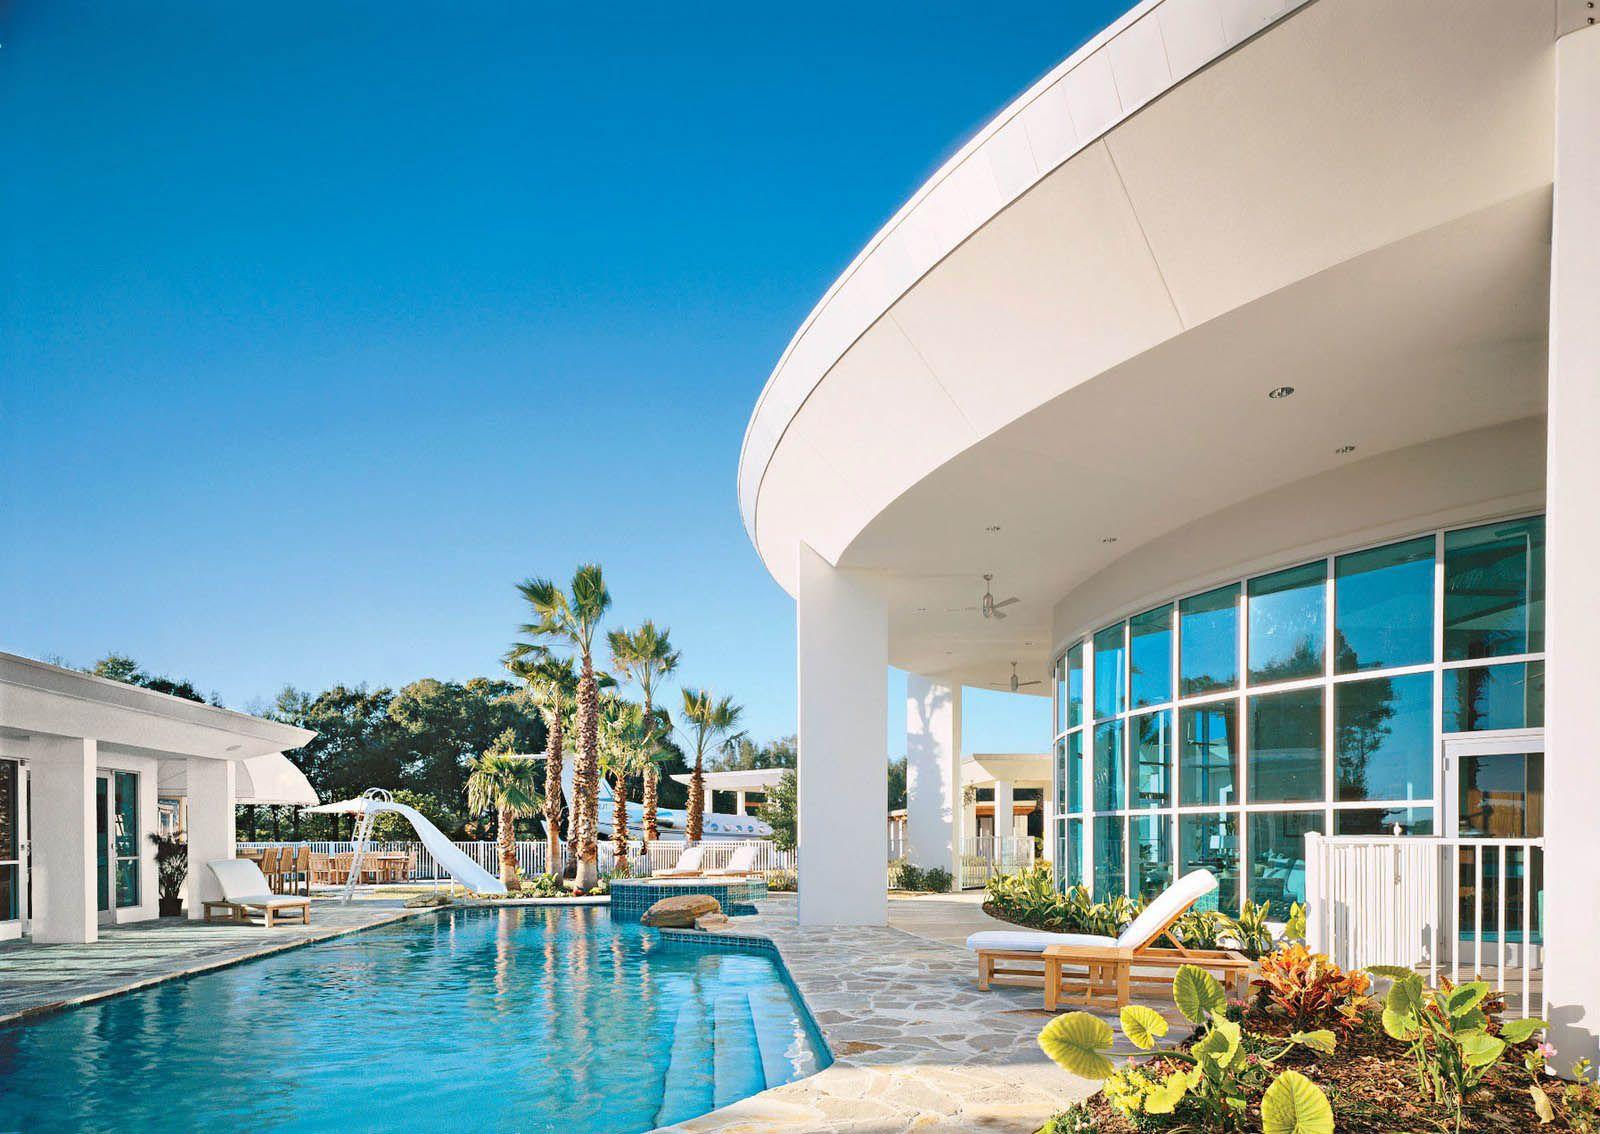 casa john travolta florida piscina